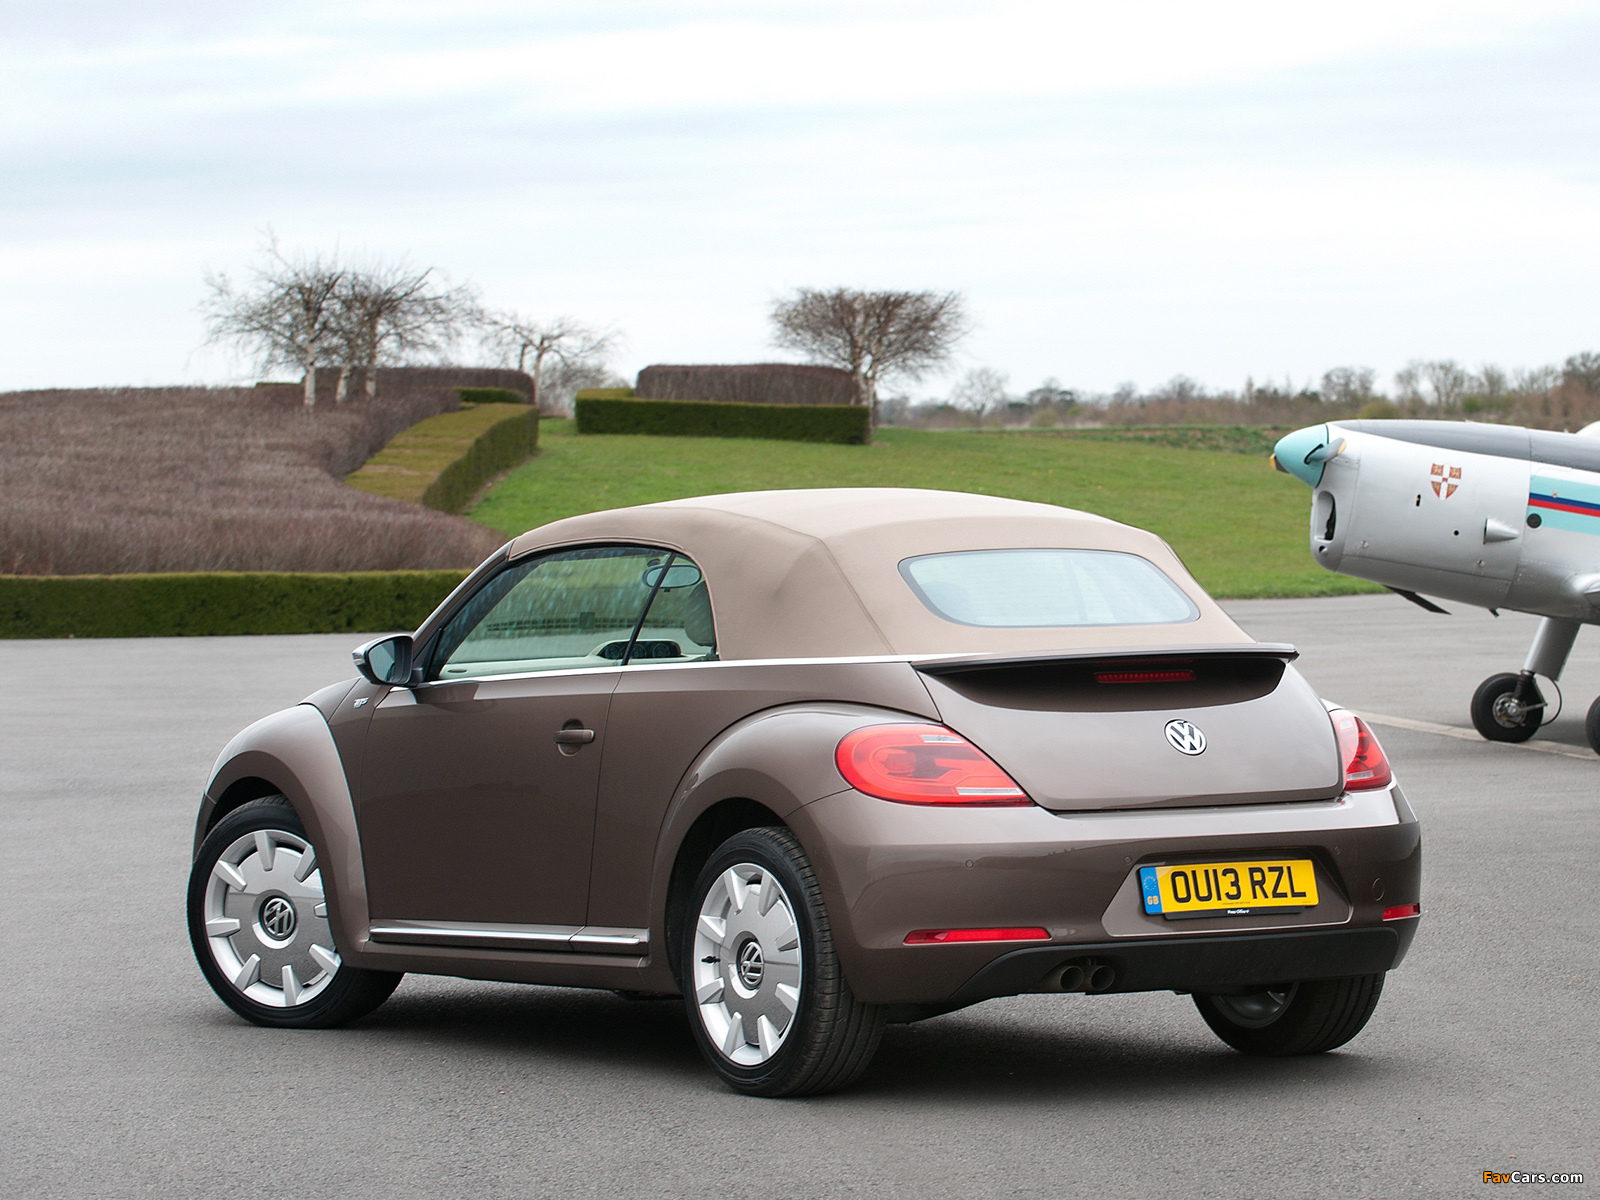 Volkswagen Beetle Cabrio 70s Edition UK-spec 2013 photos (1600 x 1200)